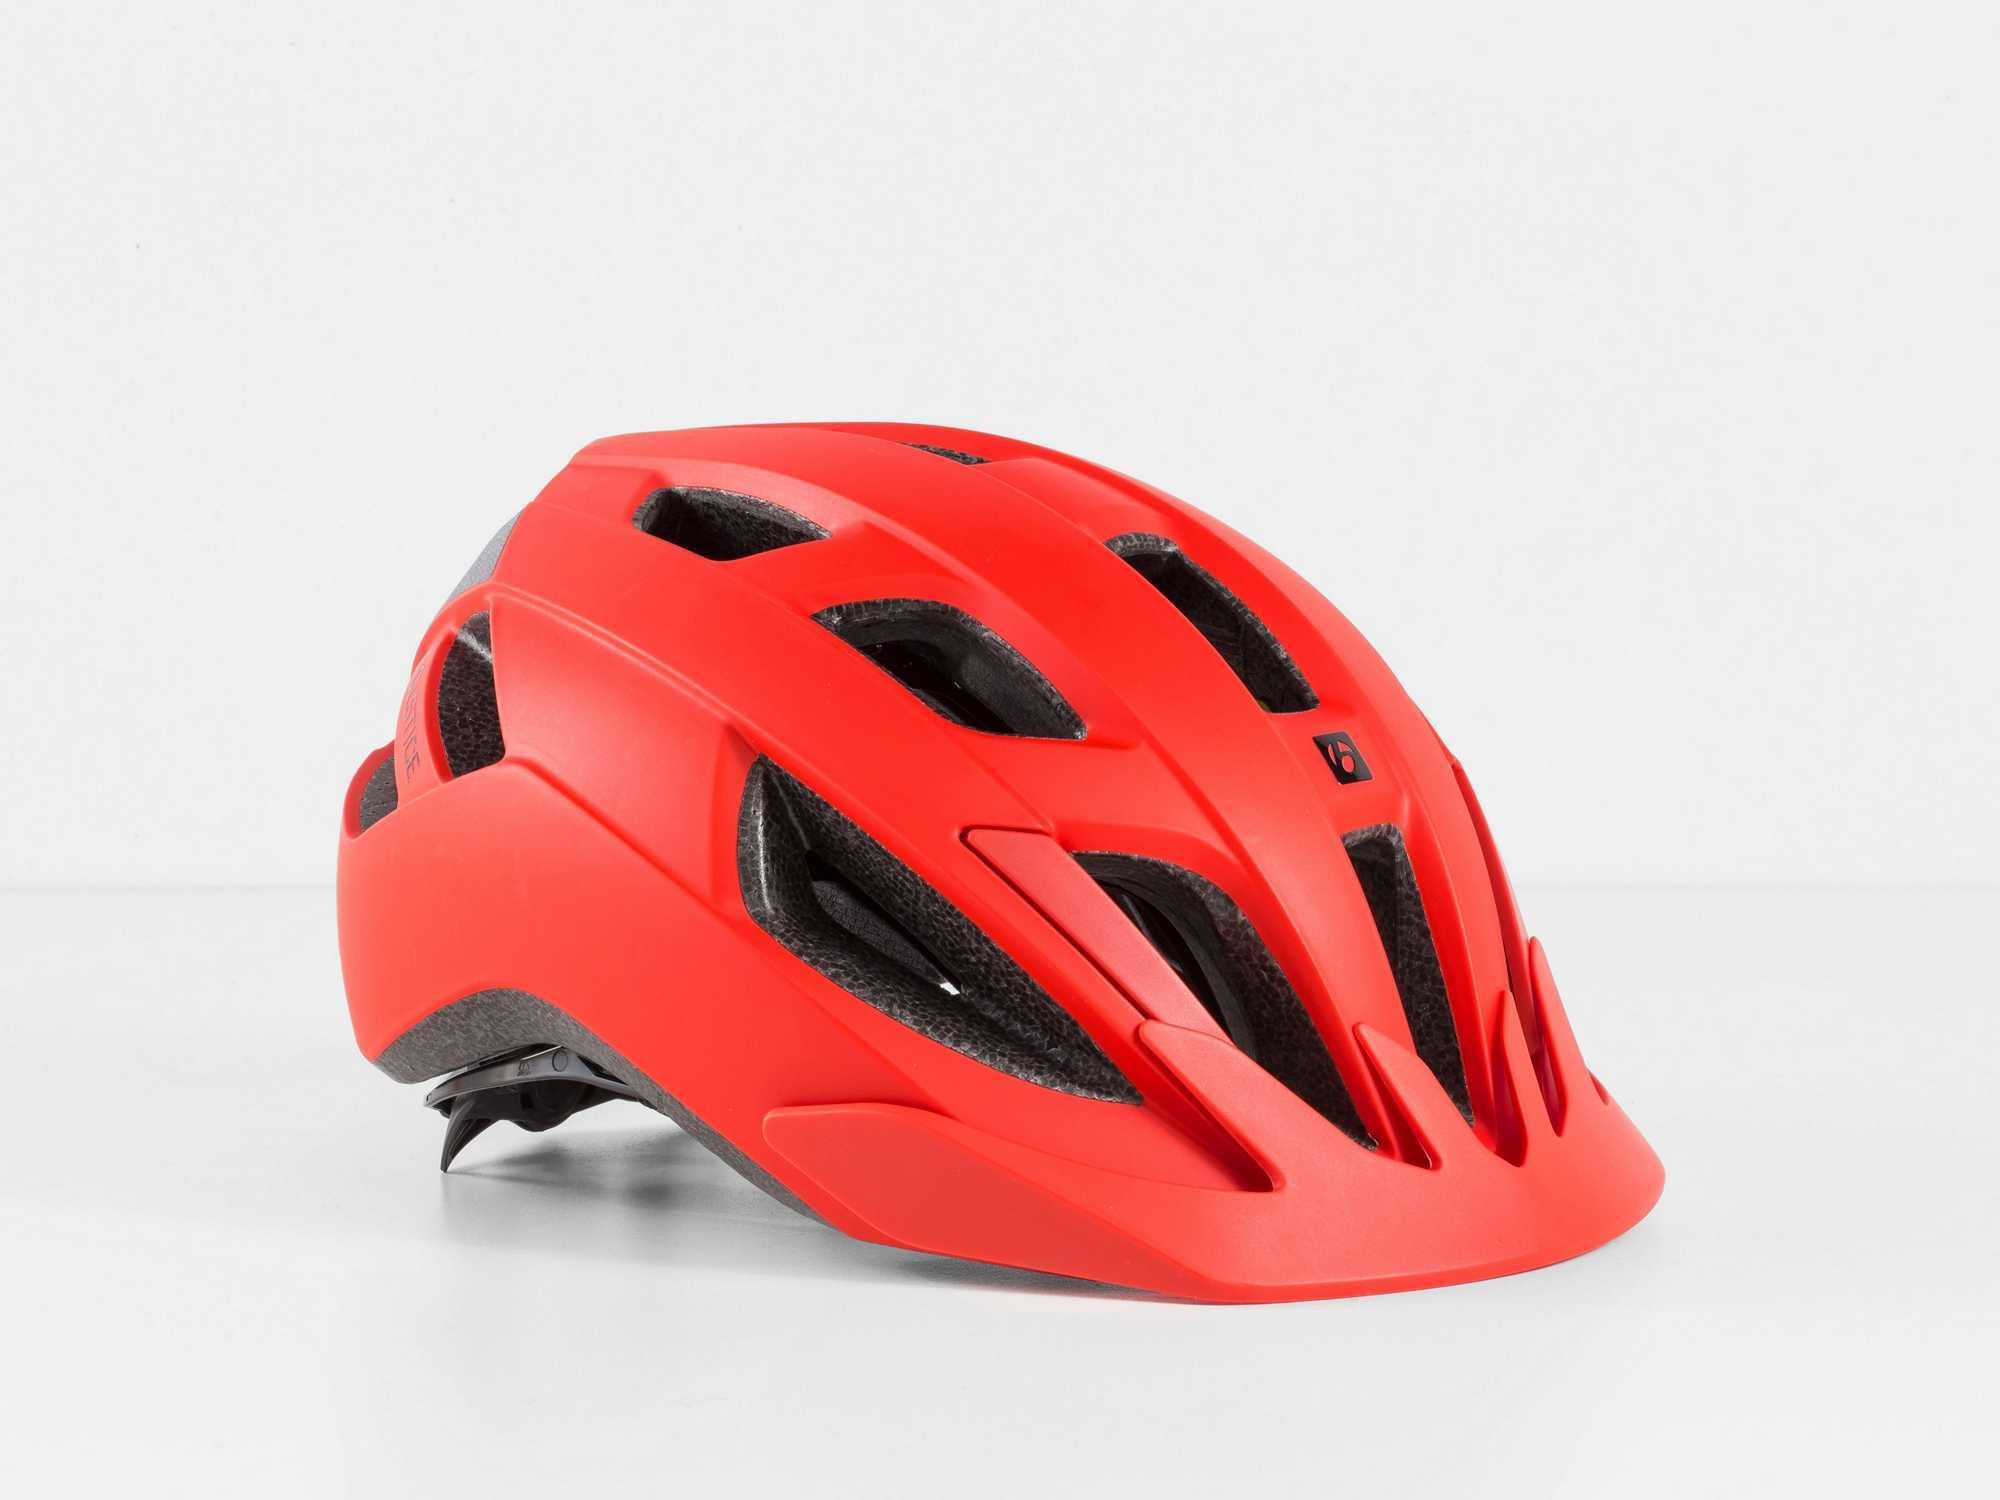 Hjälm Bontrager Solstice MIPS röd | Helmets